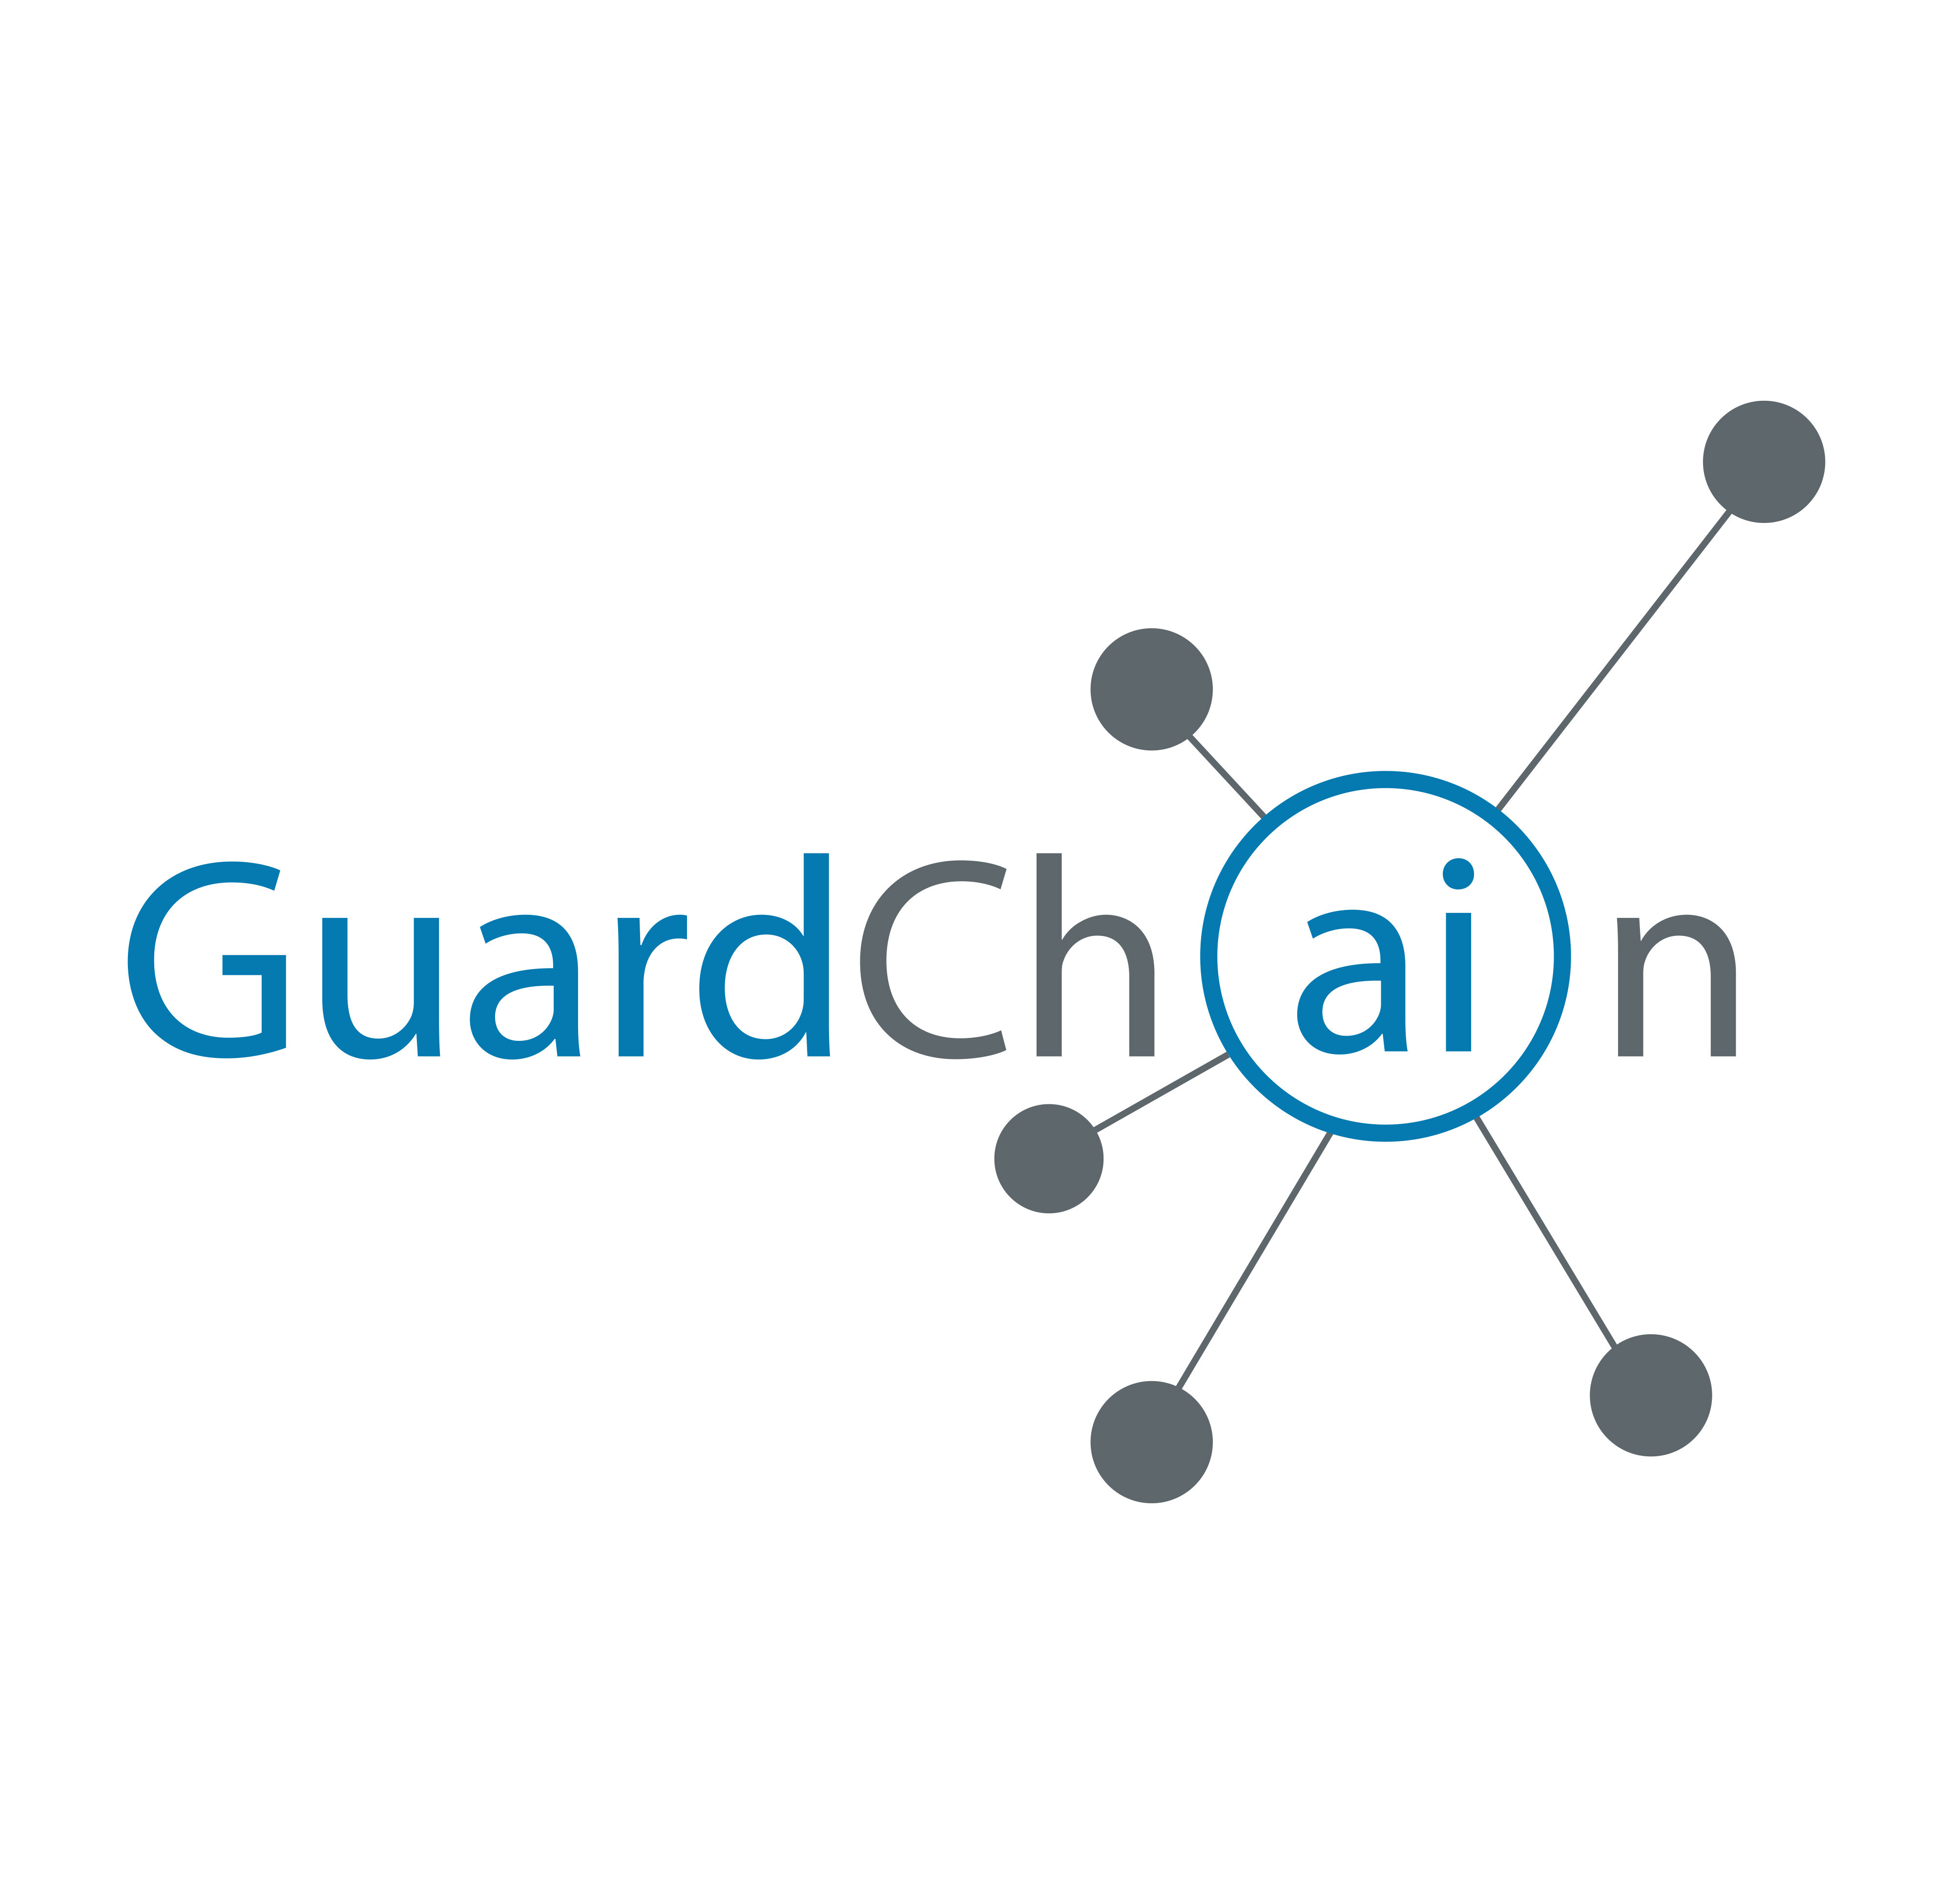 GuardChain